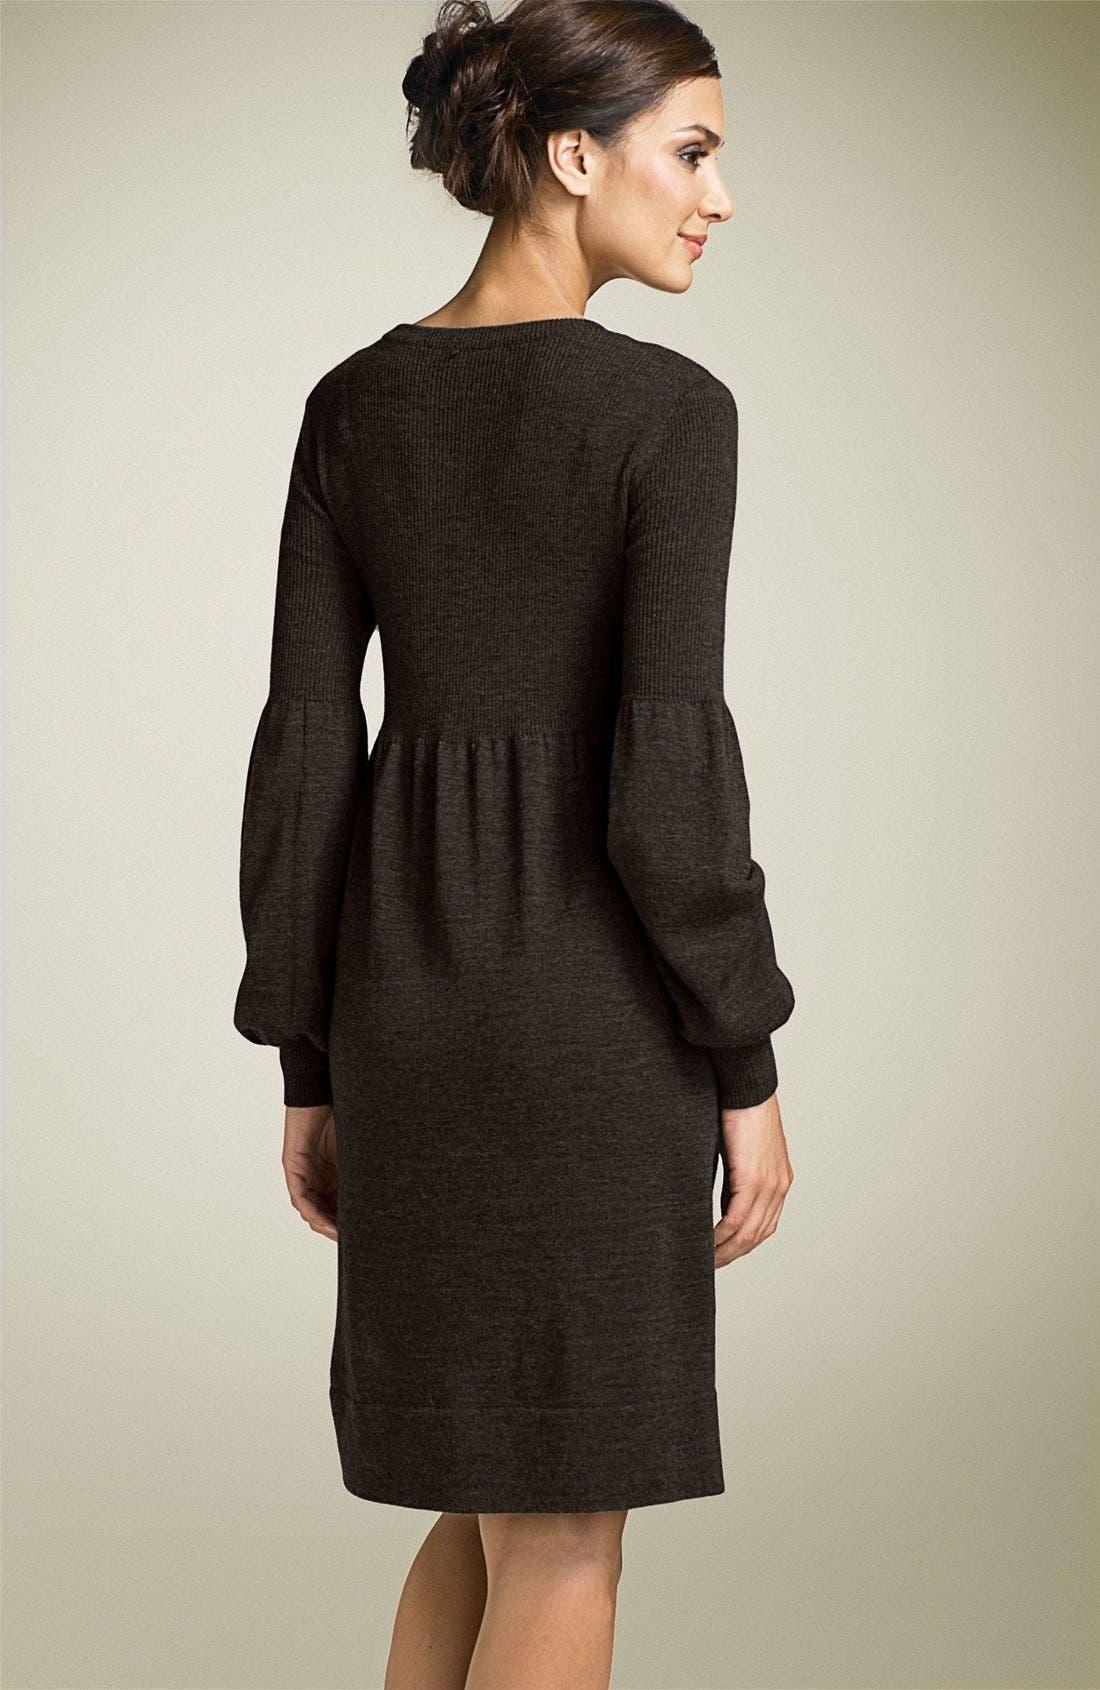 Alternate Image 2  - Calvin Klein Scoop Neck Sweater Dress